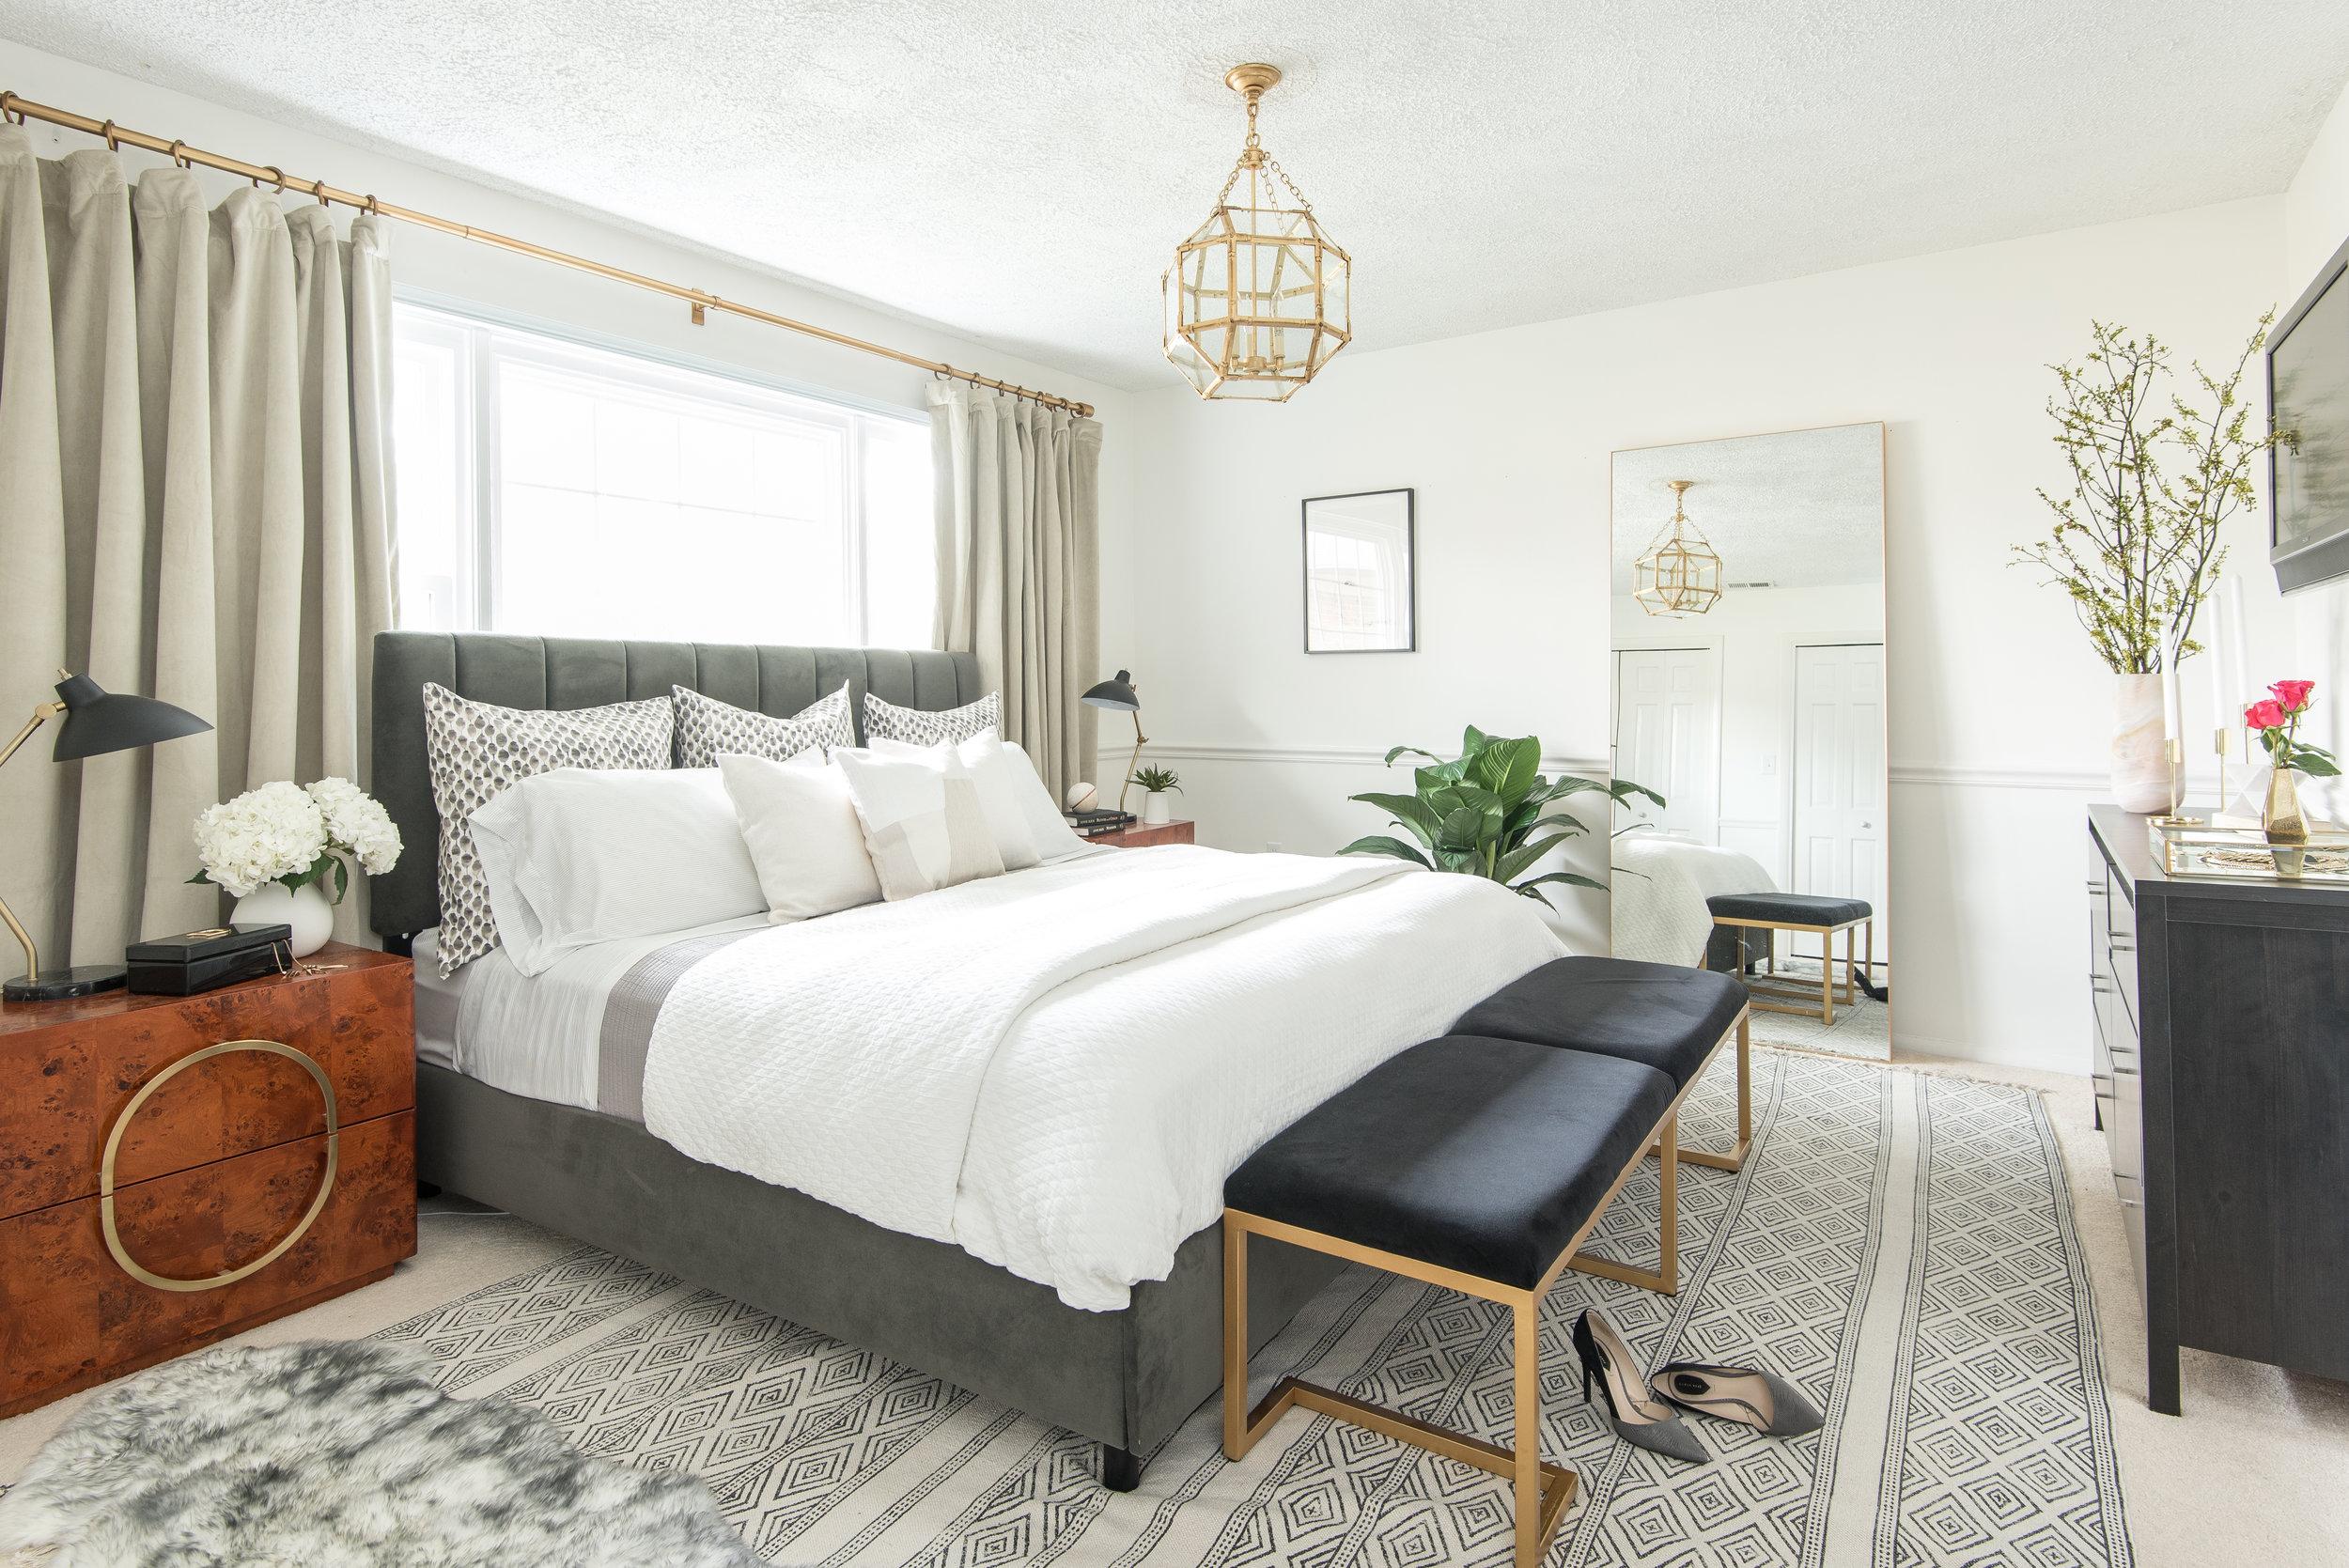 bedroom-interior-design-home-decoration-mariella-cruzado-splendor-styling-washington-dc.jpg